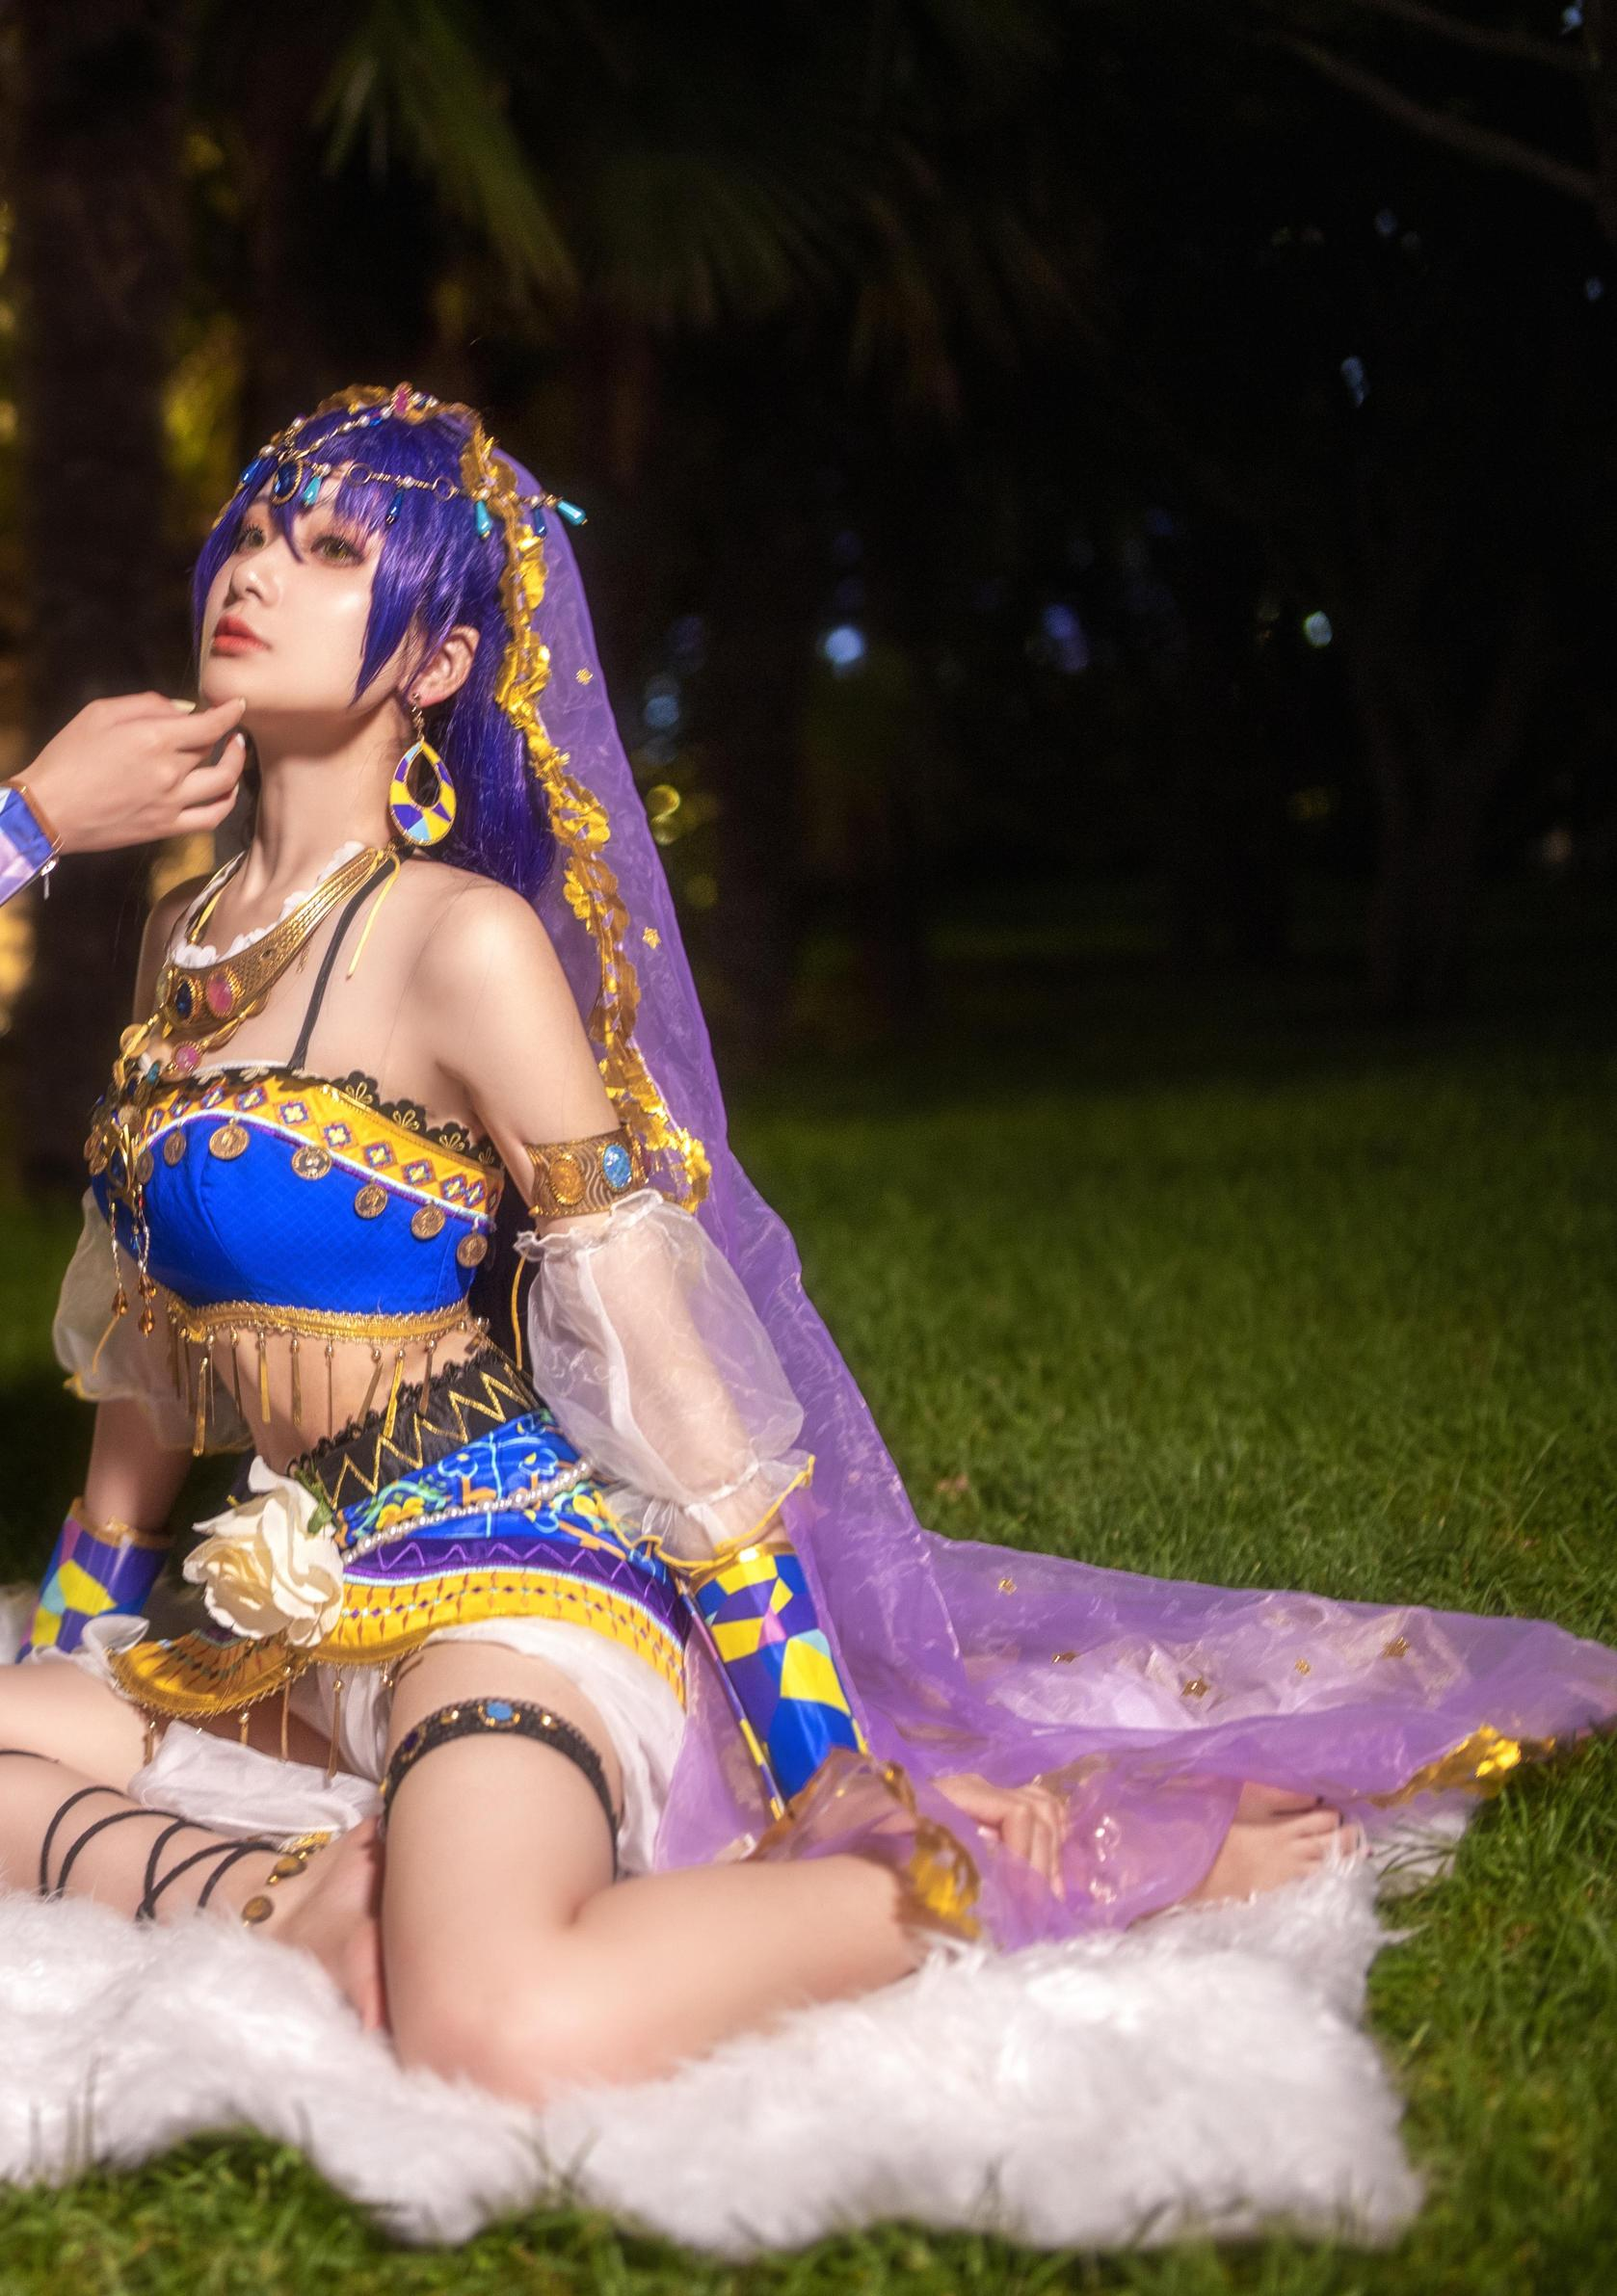 《LOVE LIVE!》舞娘cosplay【CN:白宇不是鱼】-第4张